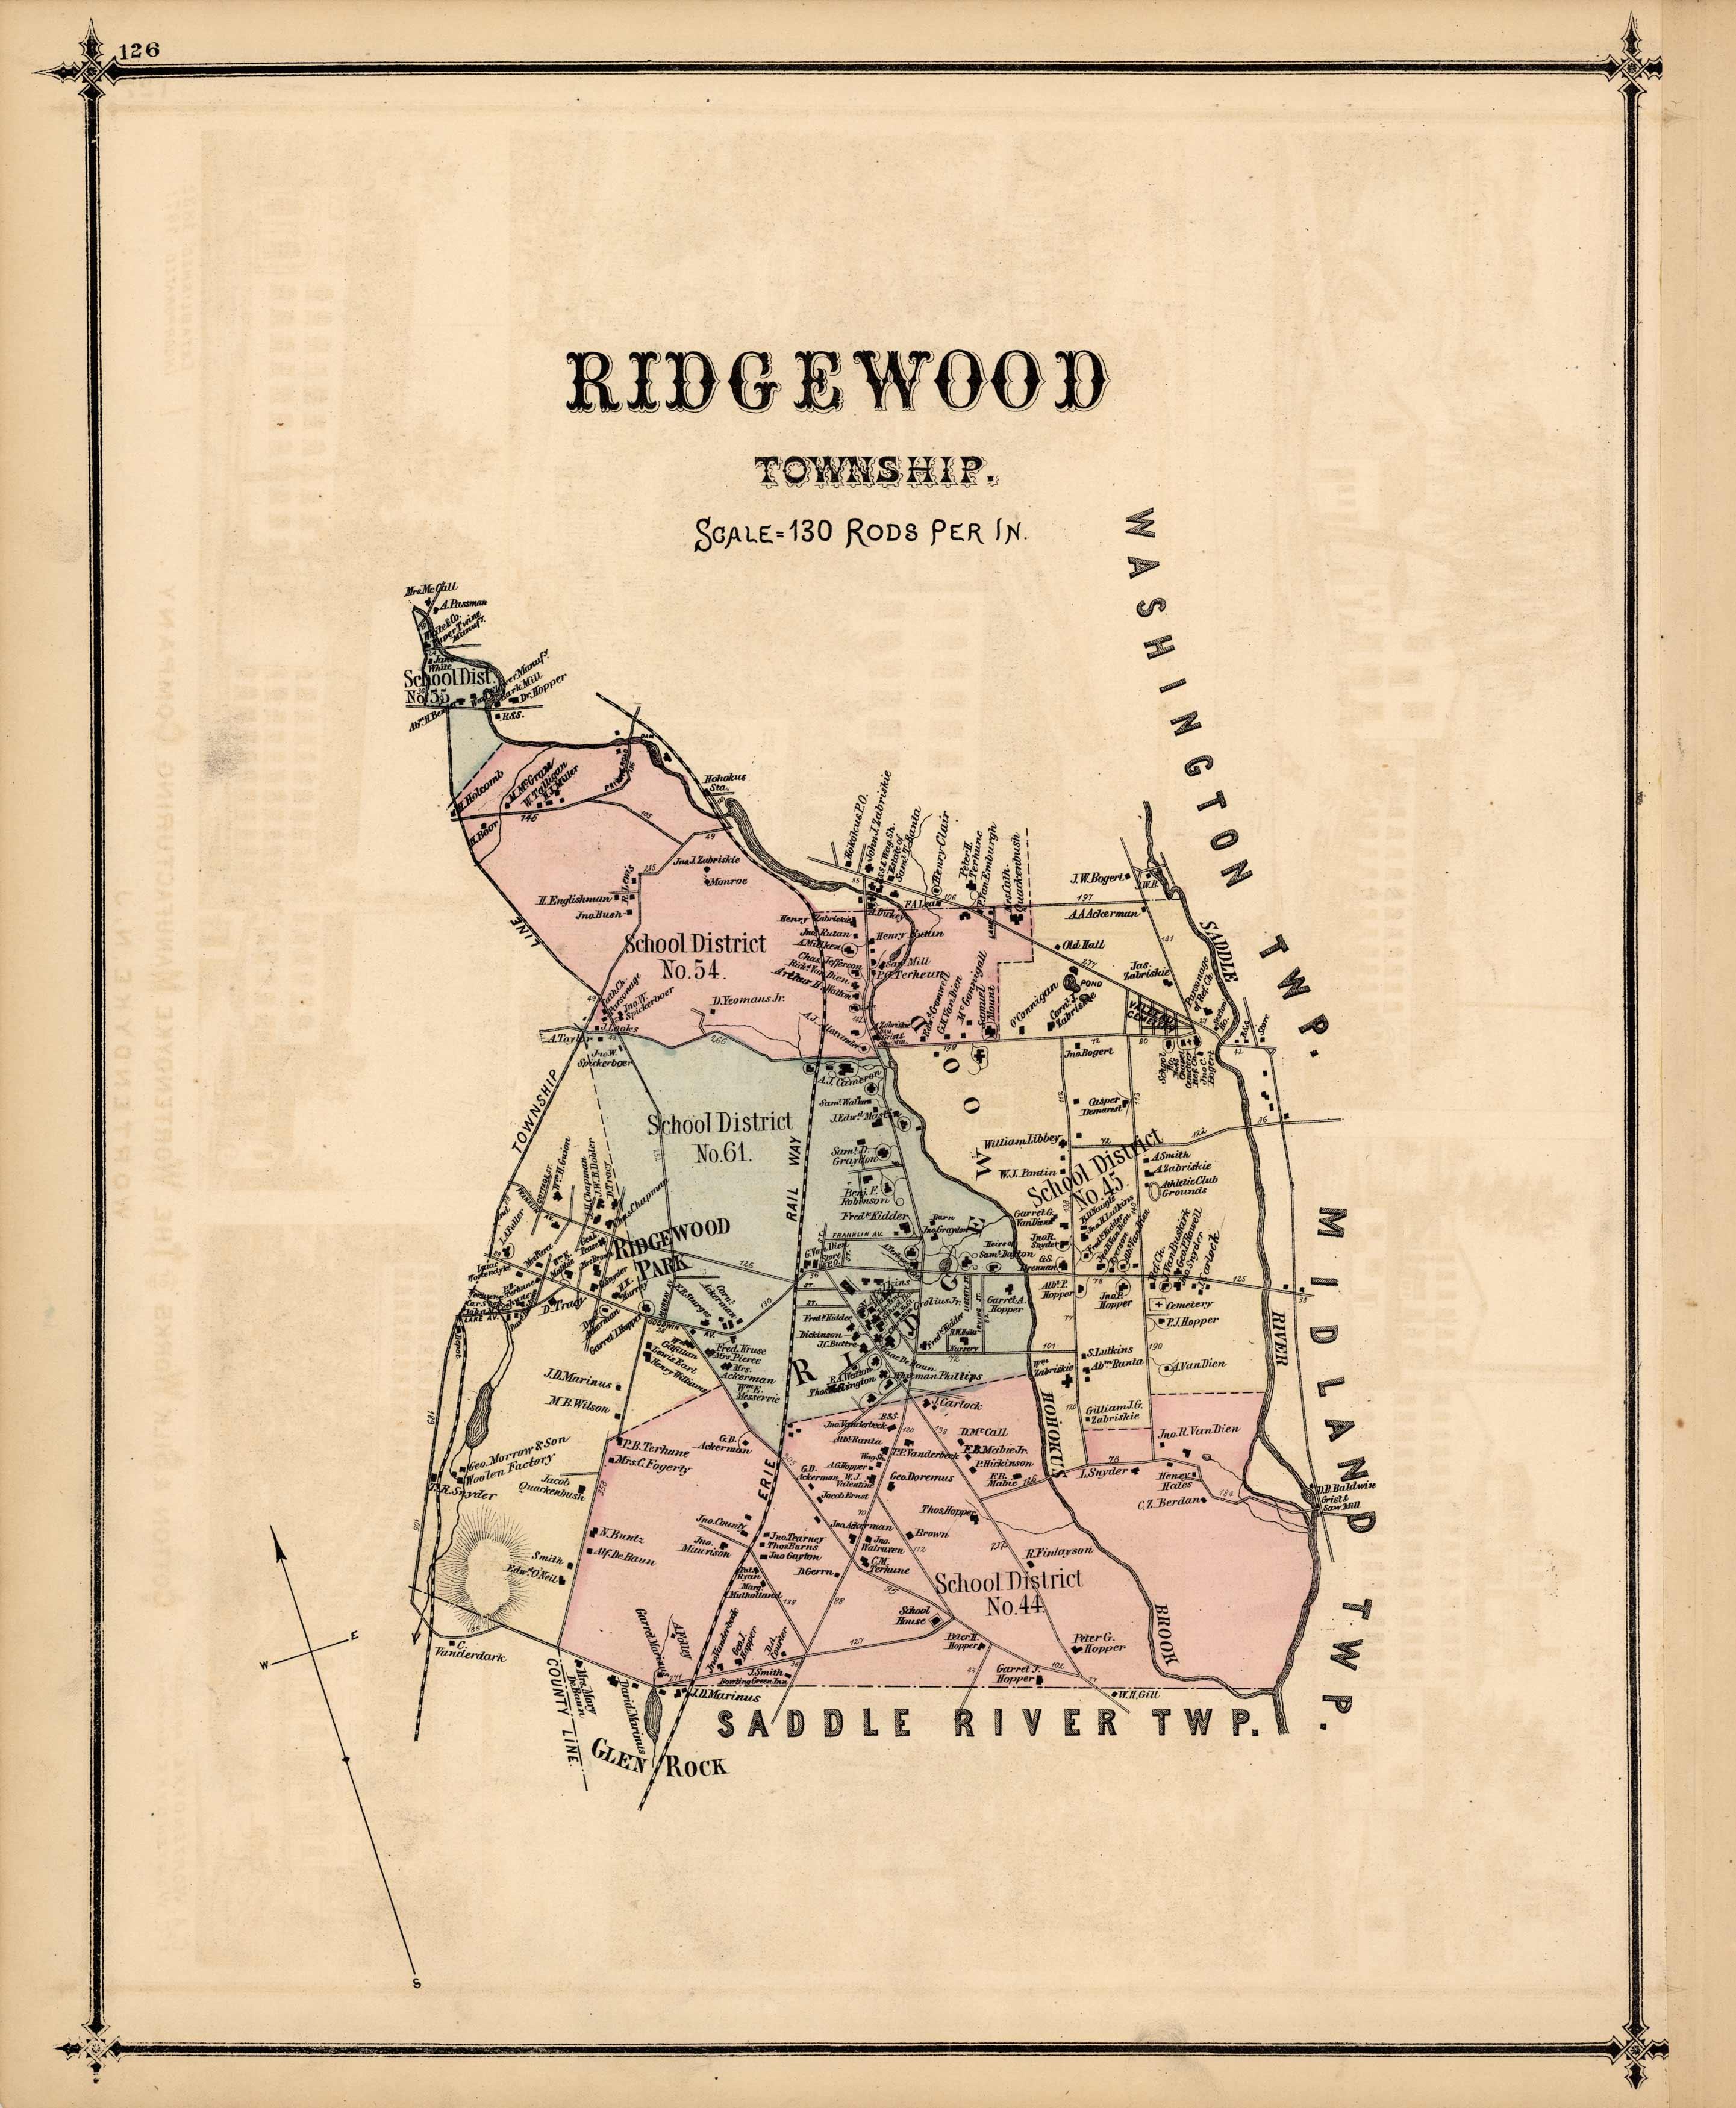 Ridgewood Township (New Jersey)